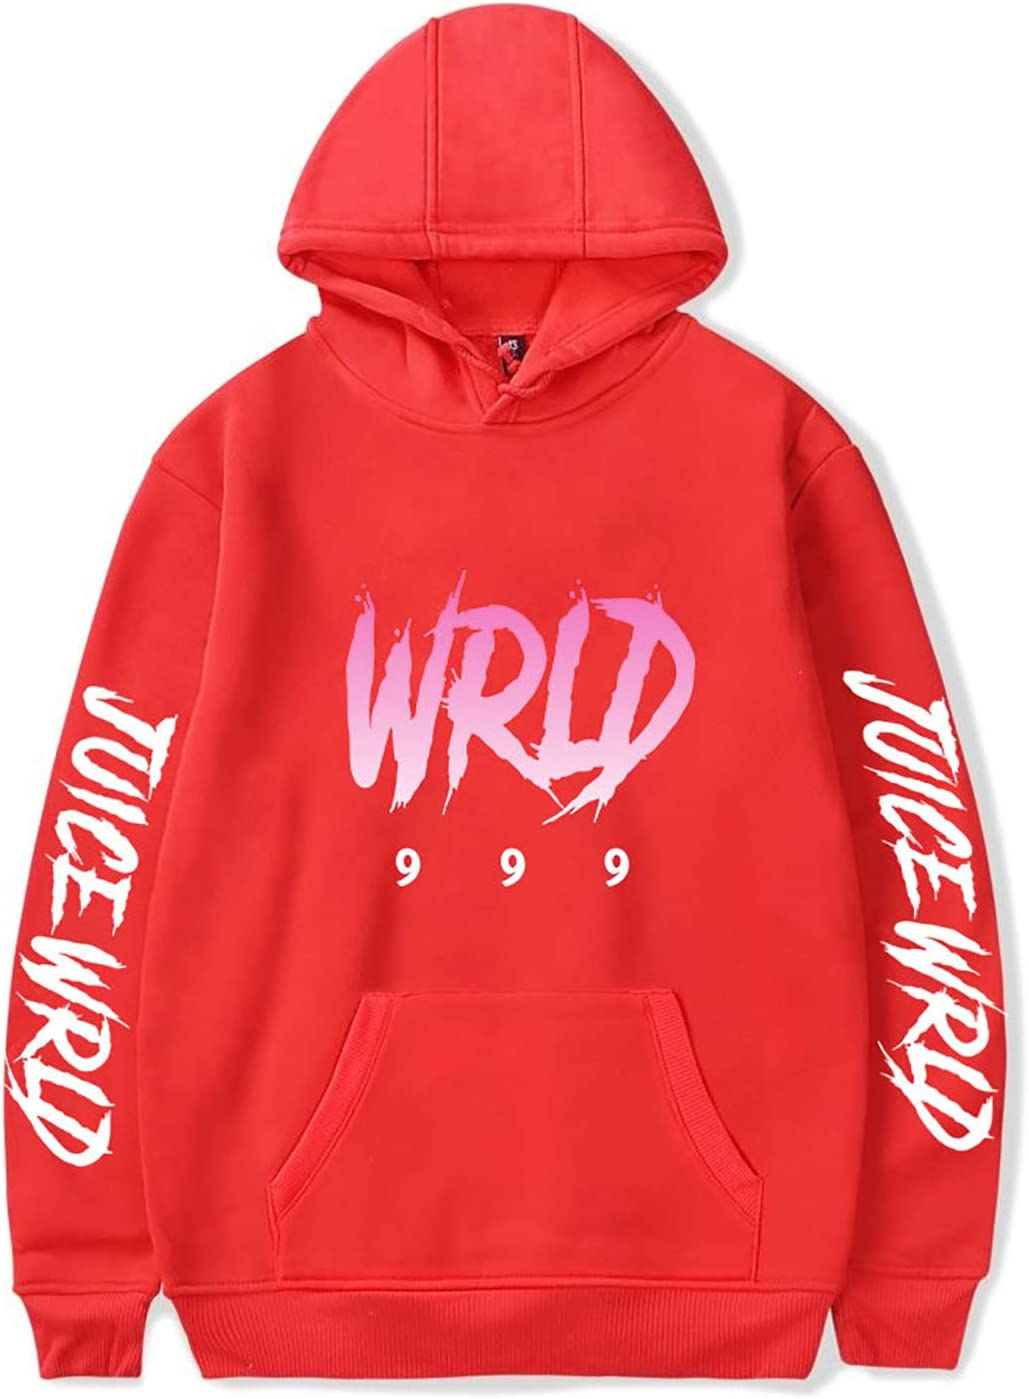 JUNG KOOK Singer Juice Hoodie 3D Sweatershirt Rapper Legend Sweaters for Men Women